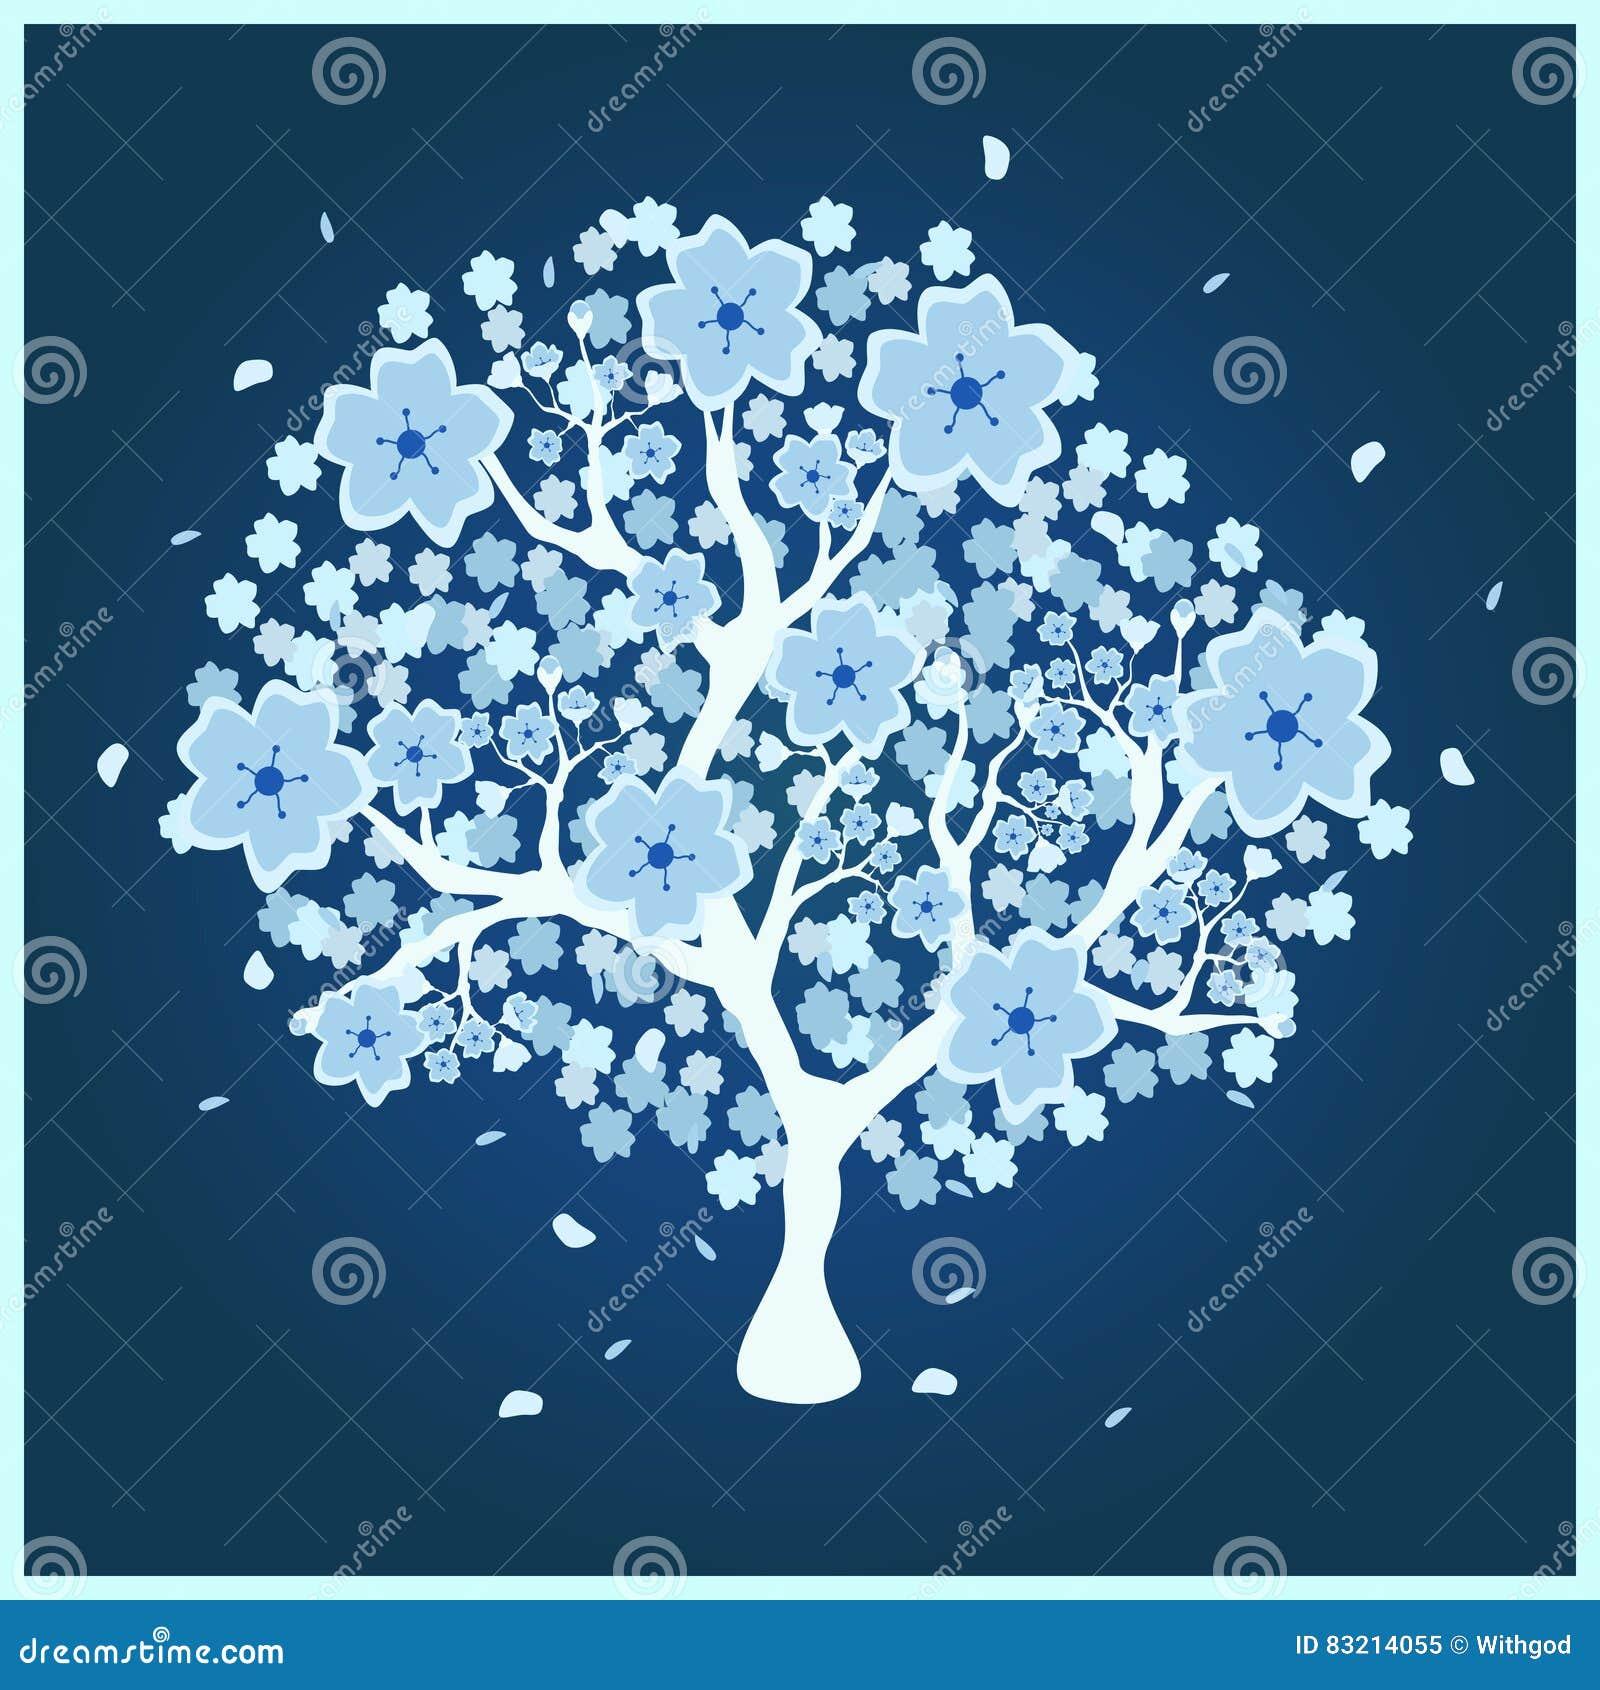 Blossom tree with blue flowers stock illustration illustration of download blossom tree with blue flowers stock illustration illustration of flower leaf 83214055 izmirmasajfo